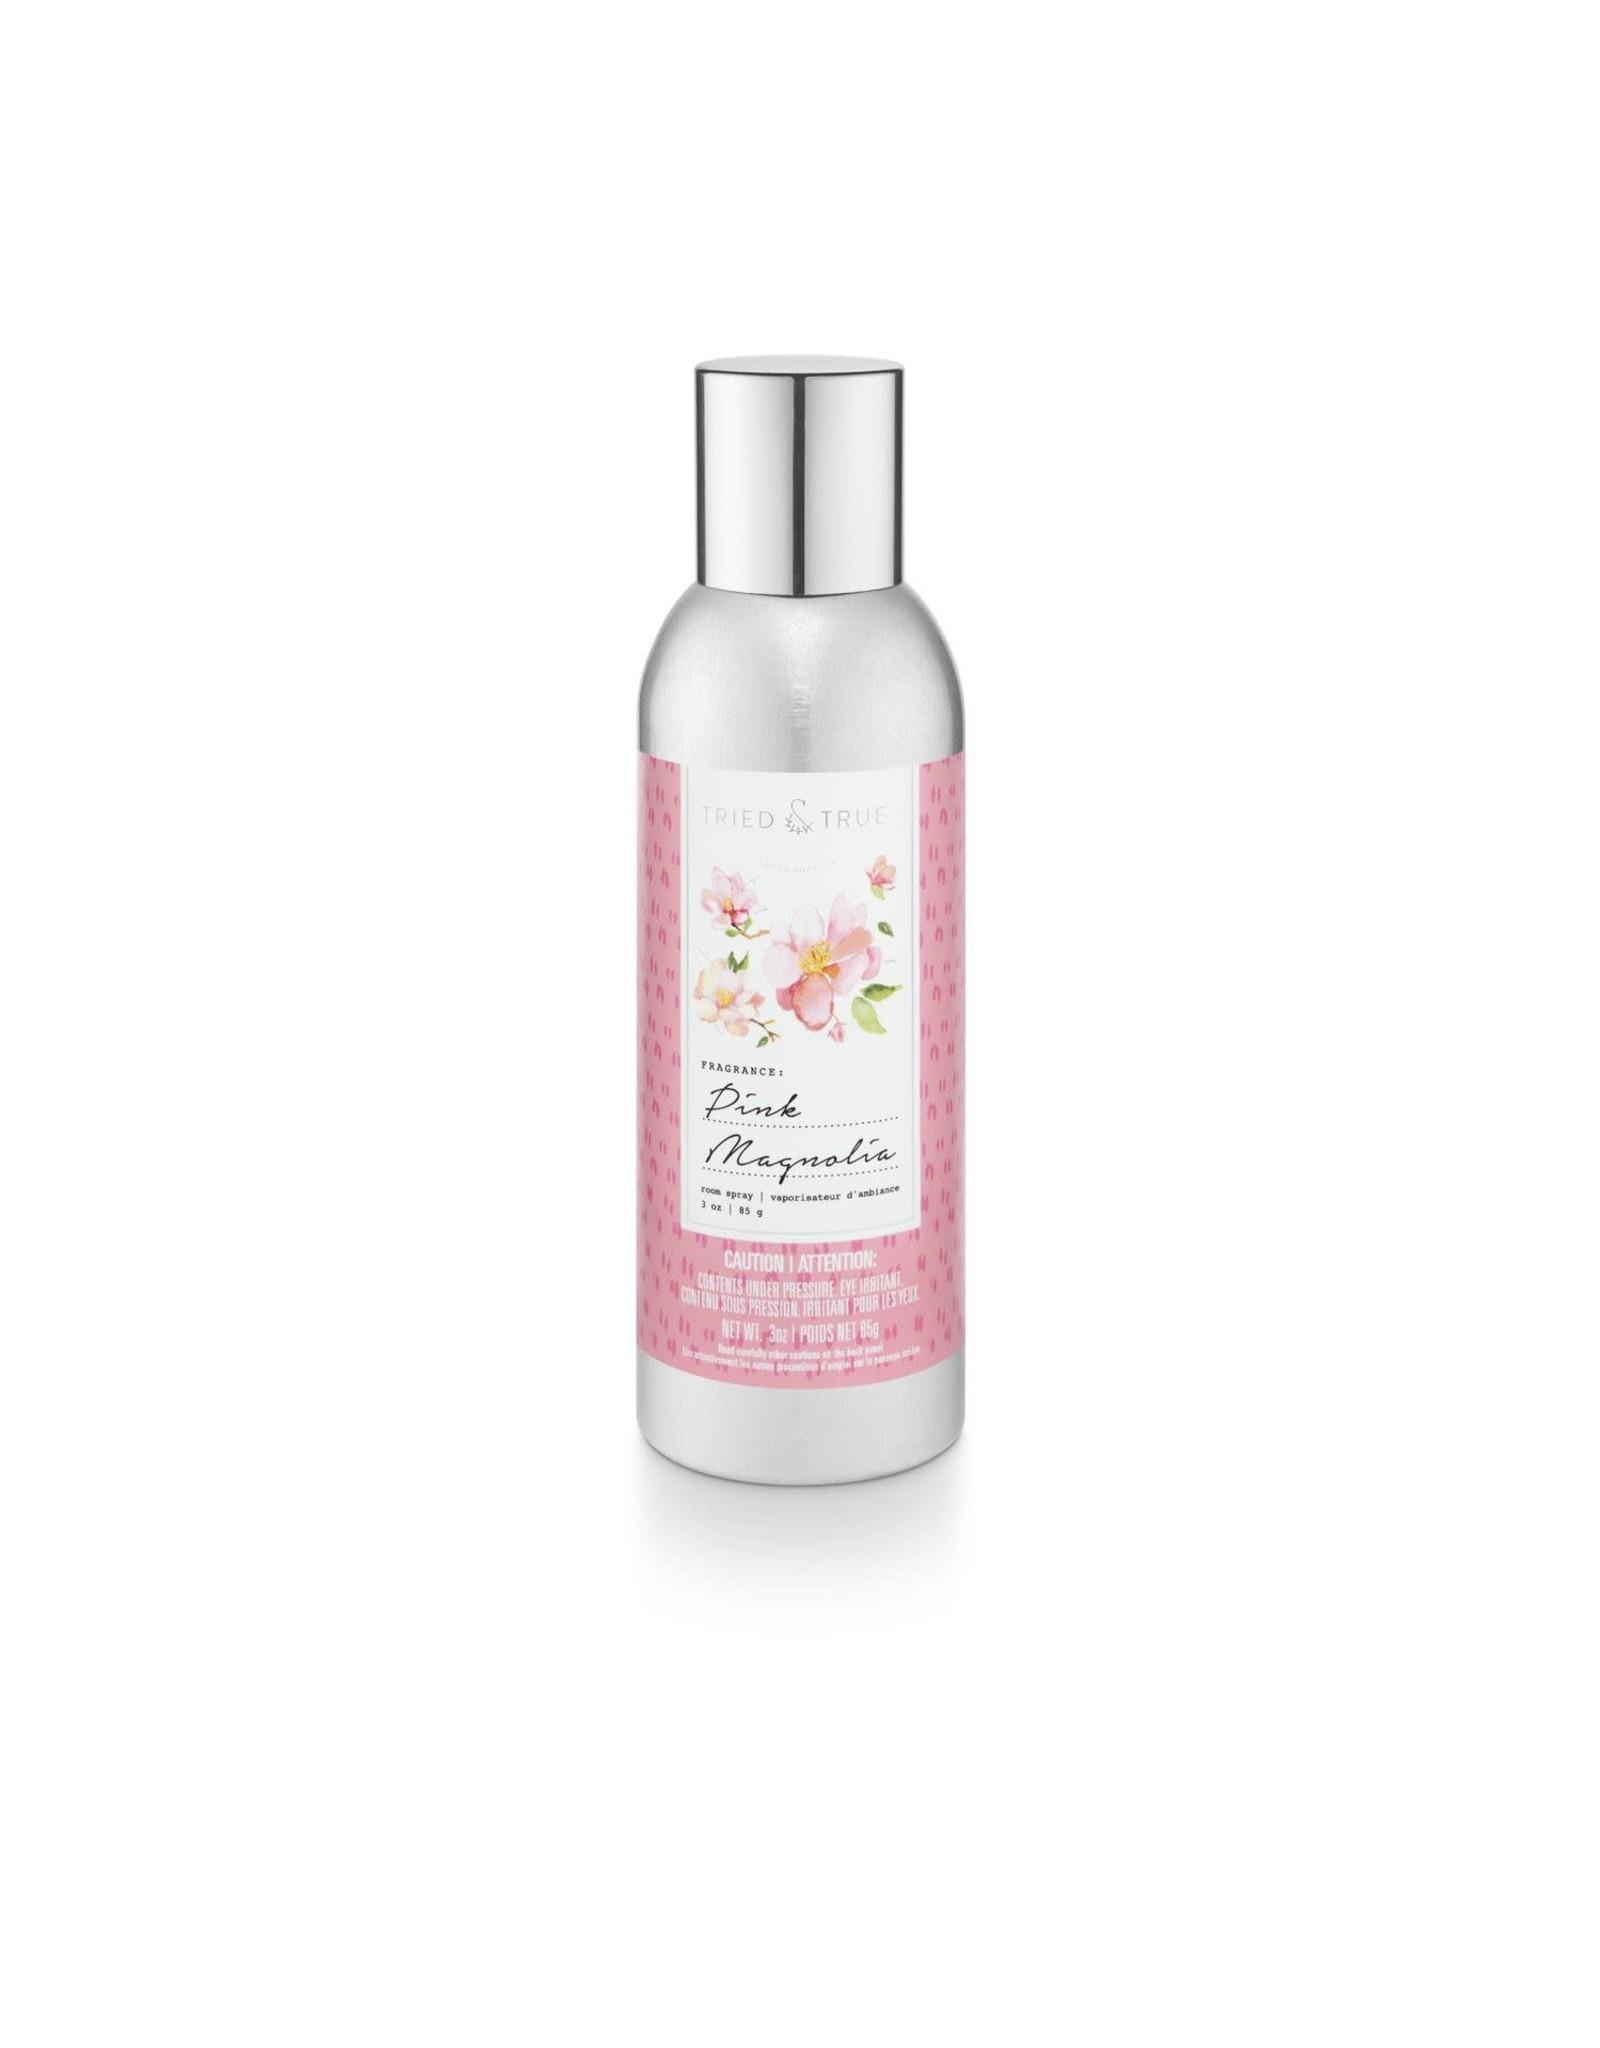 Tried & True 3 oz Room Spray - Pink Magnolia